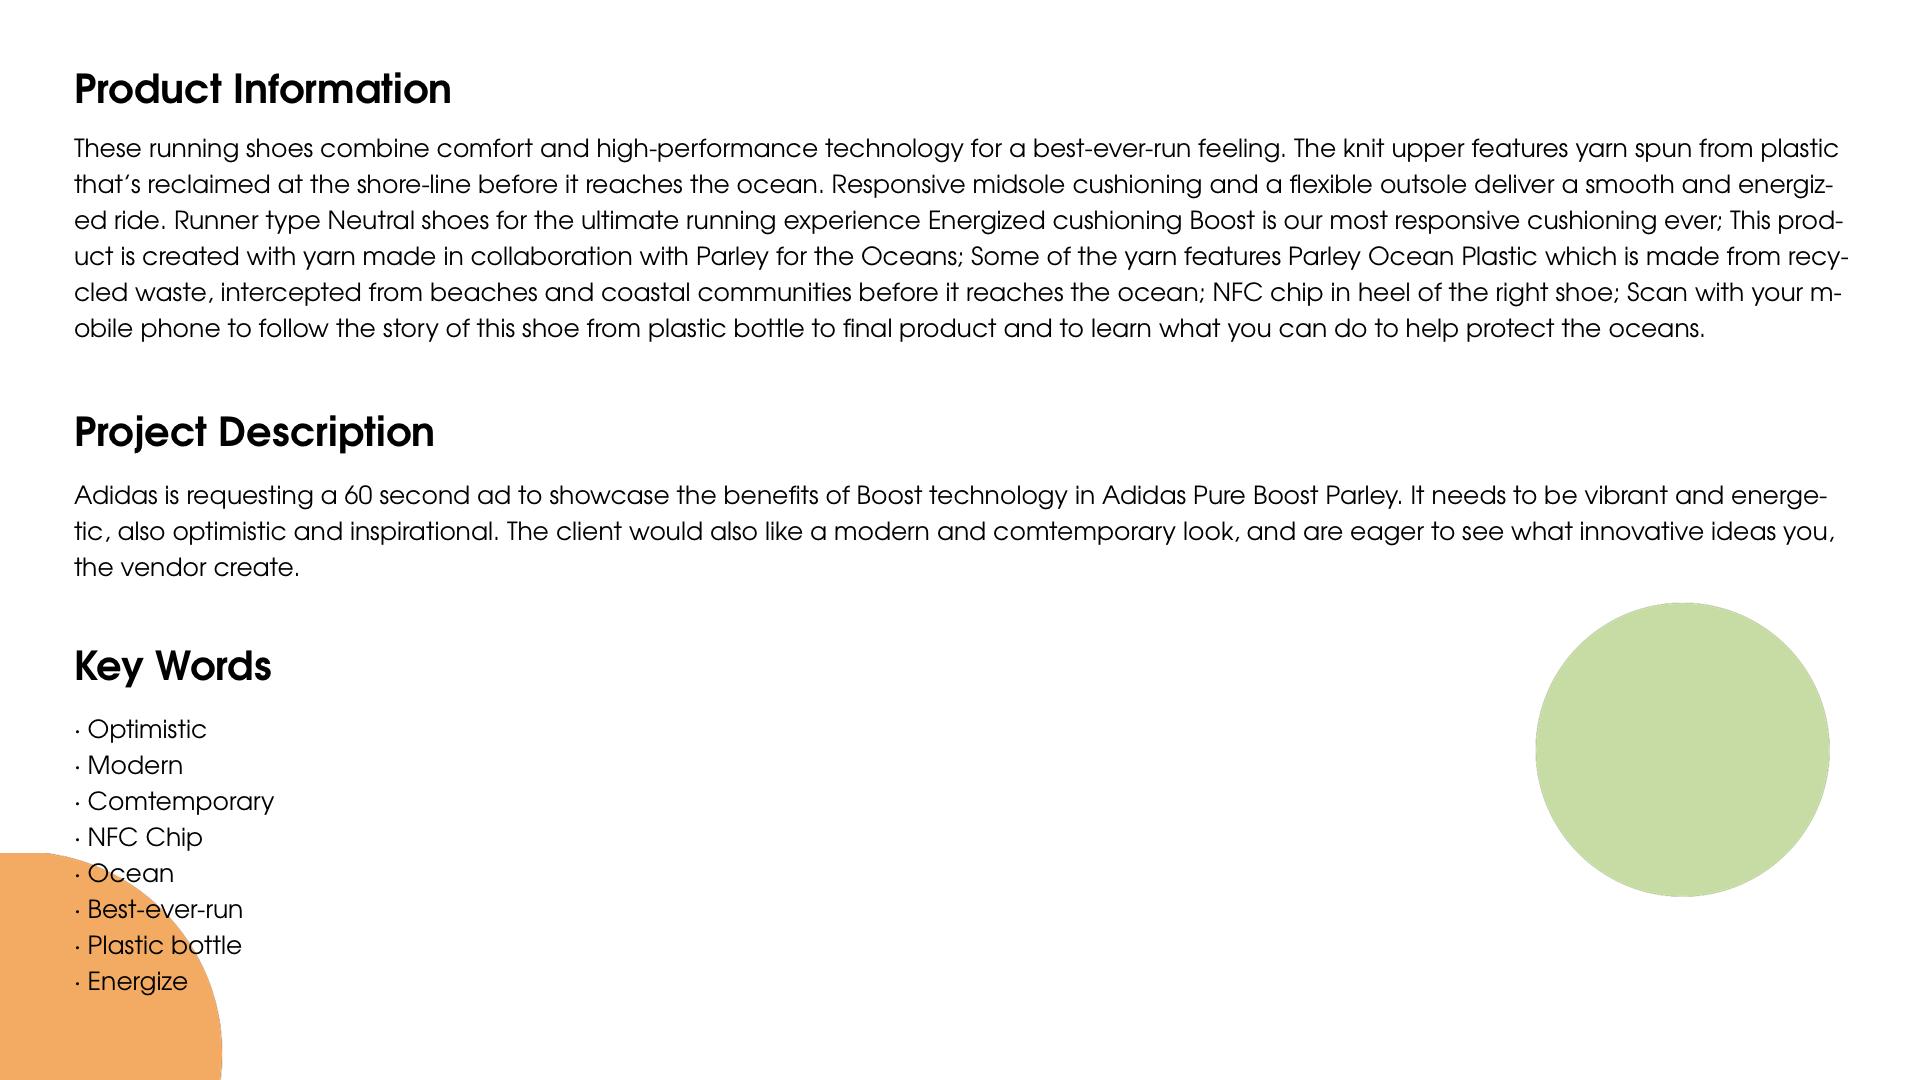 381c080e0 Tianxiao Li - Adidas Ultra Boost Parley ad Production Process Book